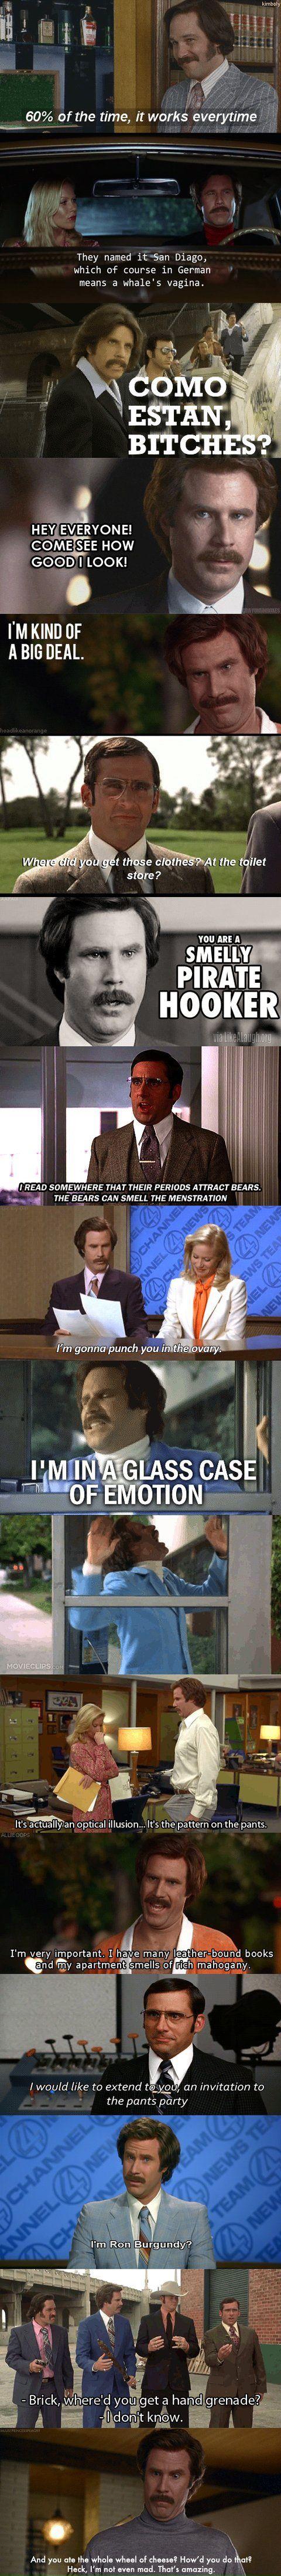 Ron Burgundy!